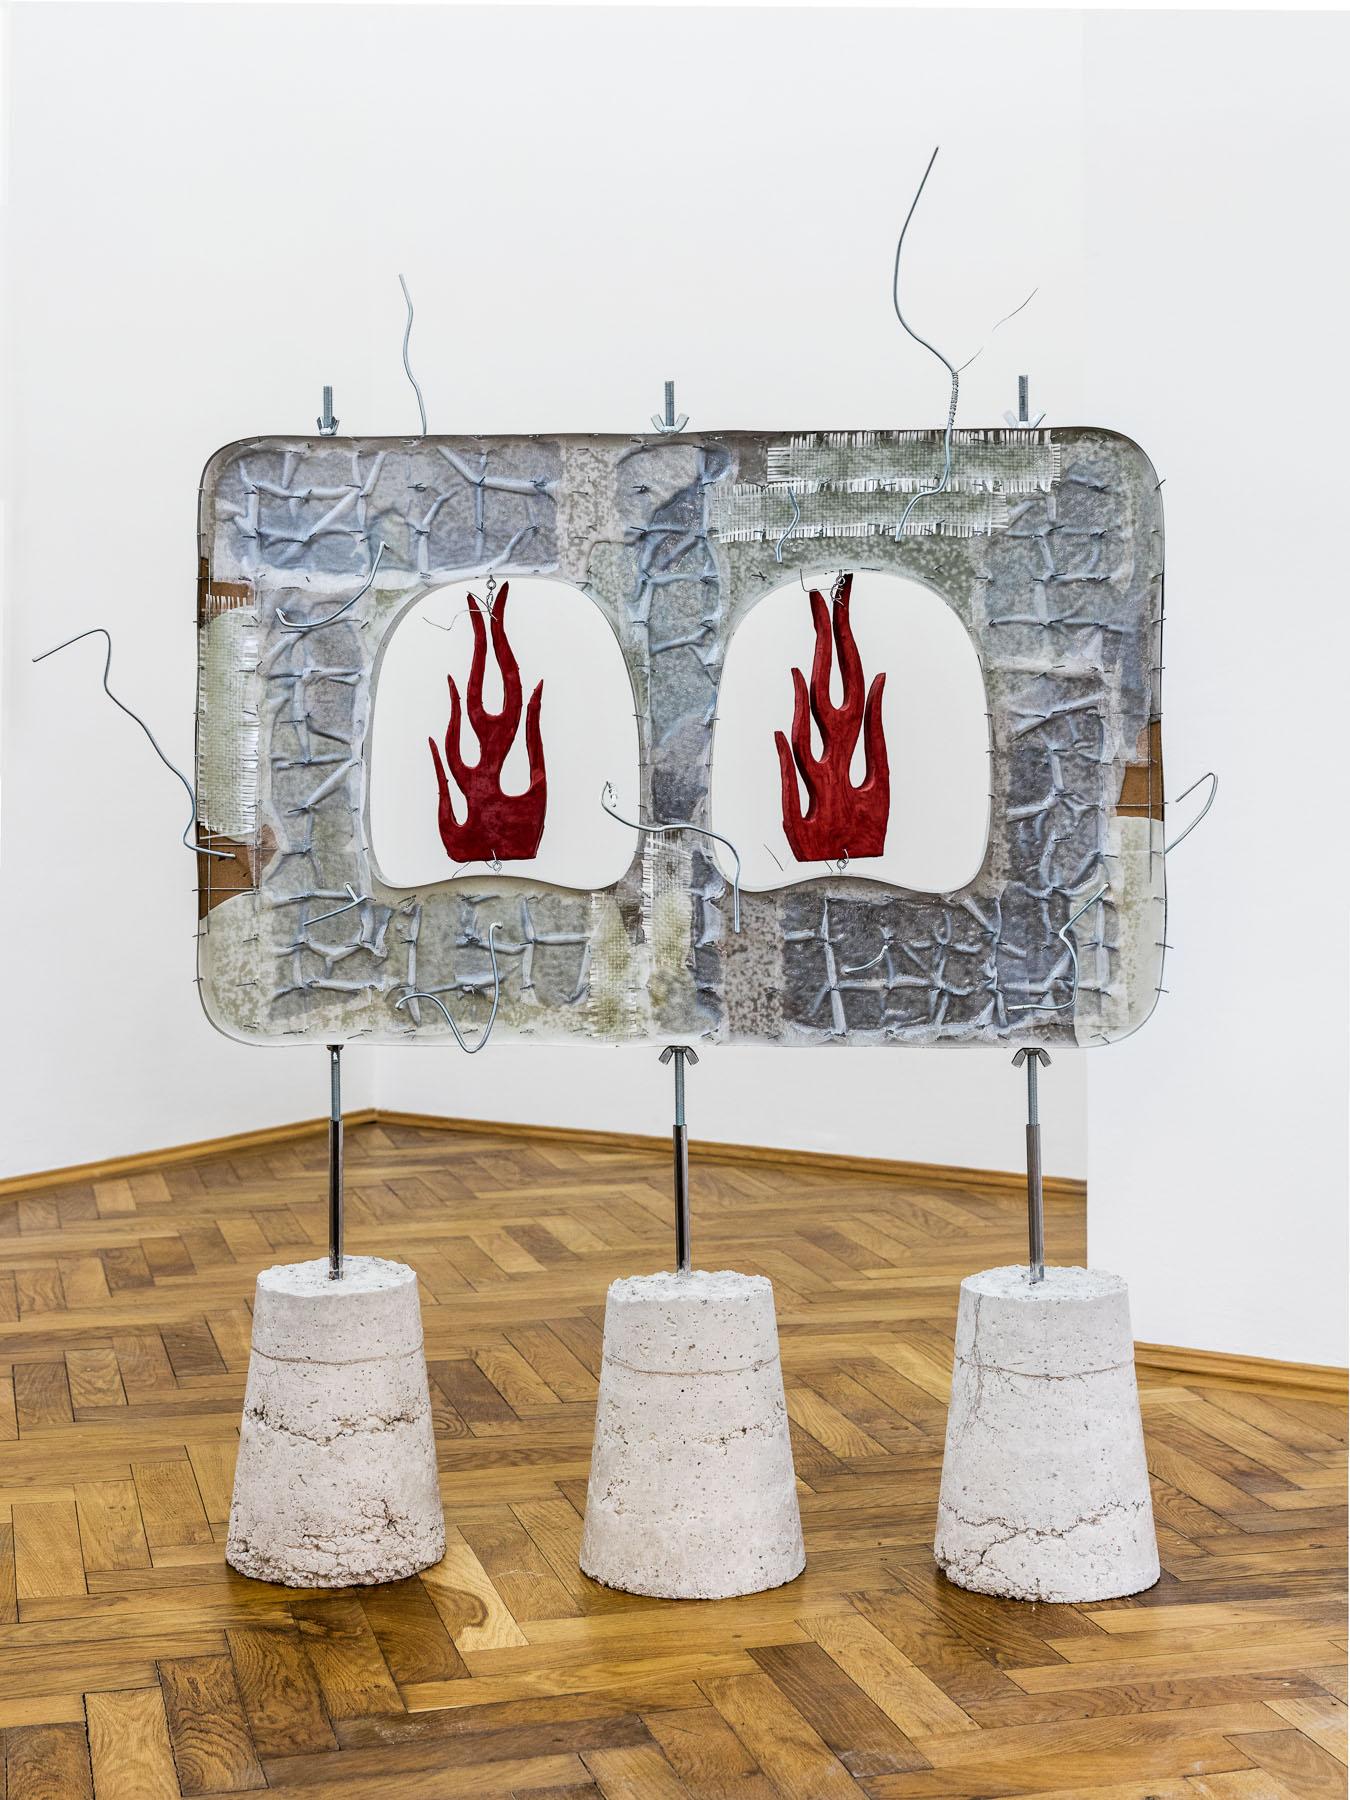 Stefan Fuchs, Something hot, 2017, Mixed media, 151 x 137 x 70 cm